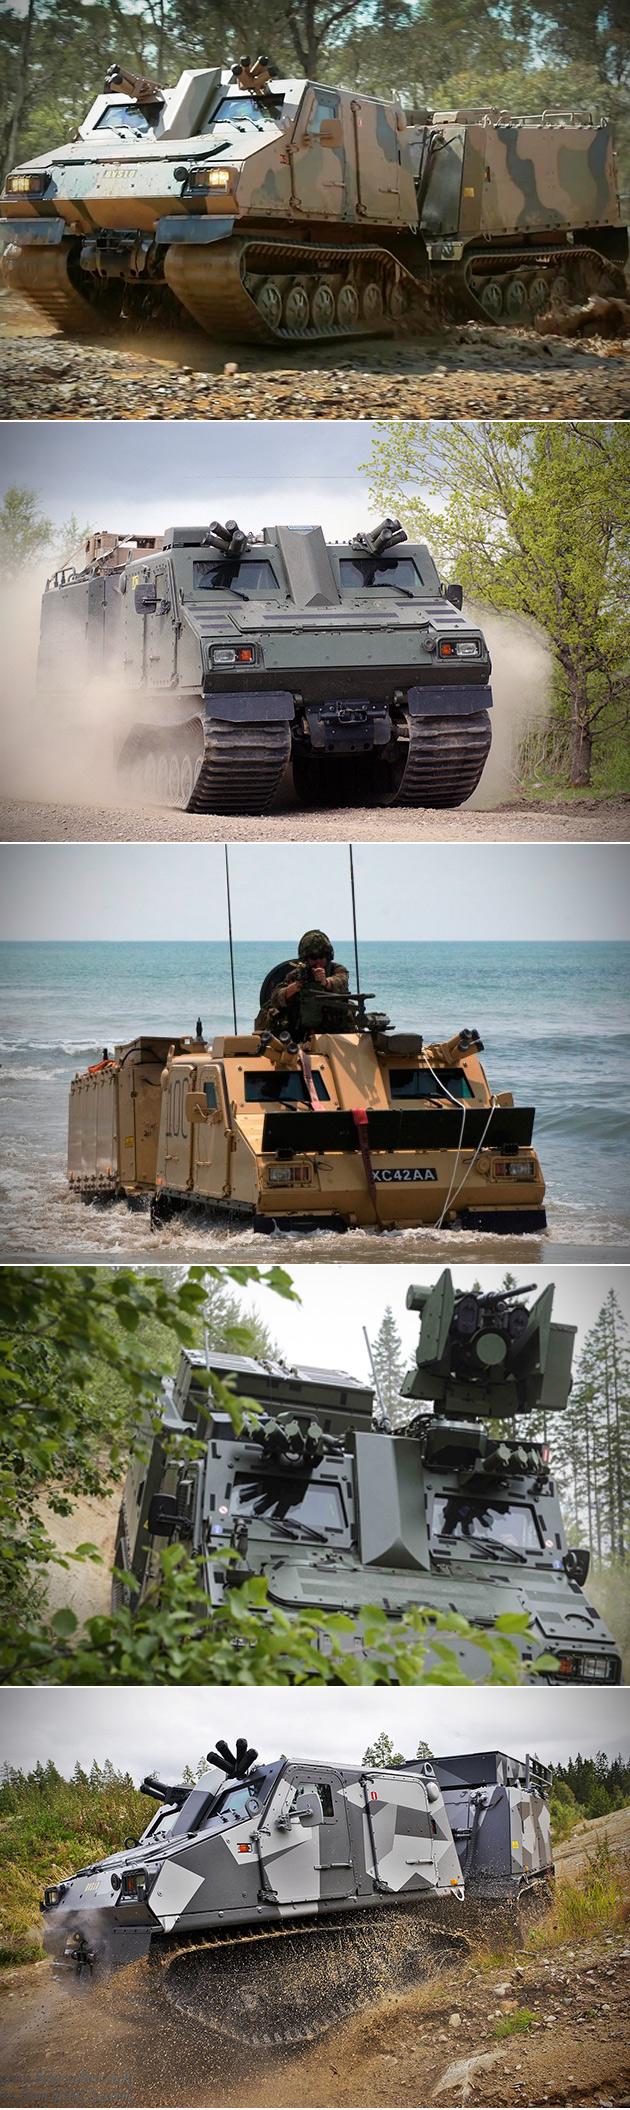 BvS 10 Armored Vehicle